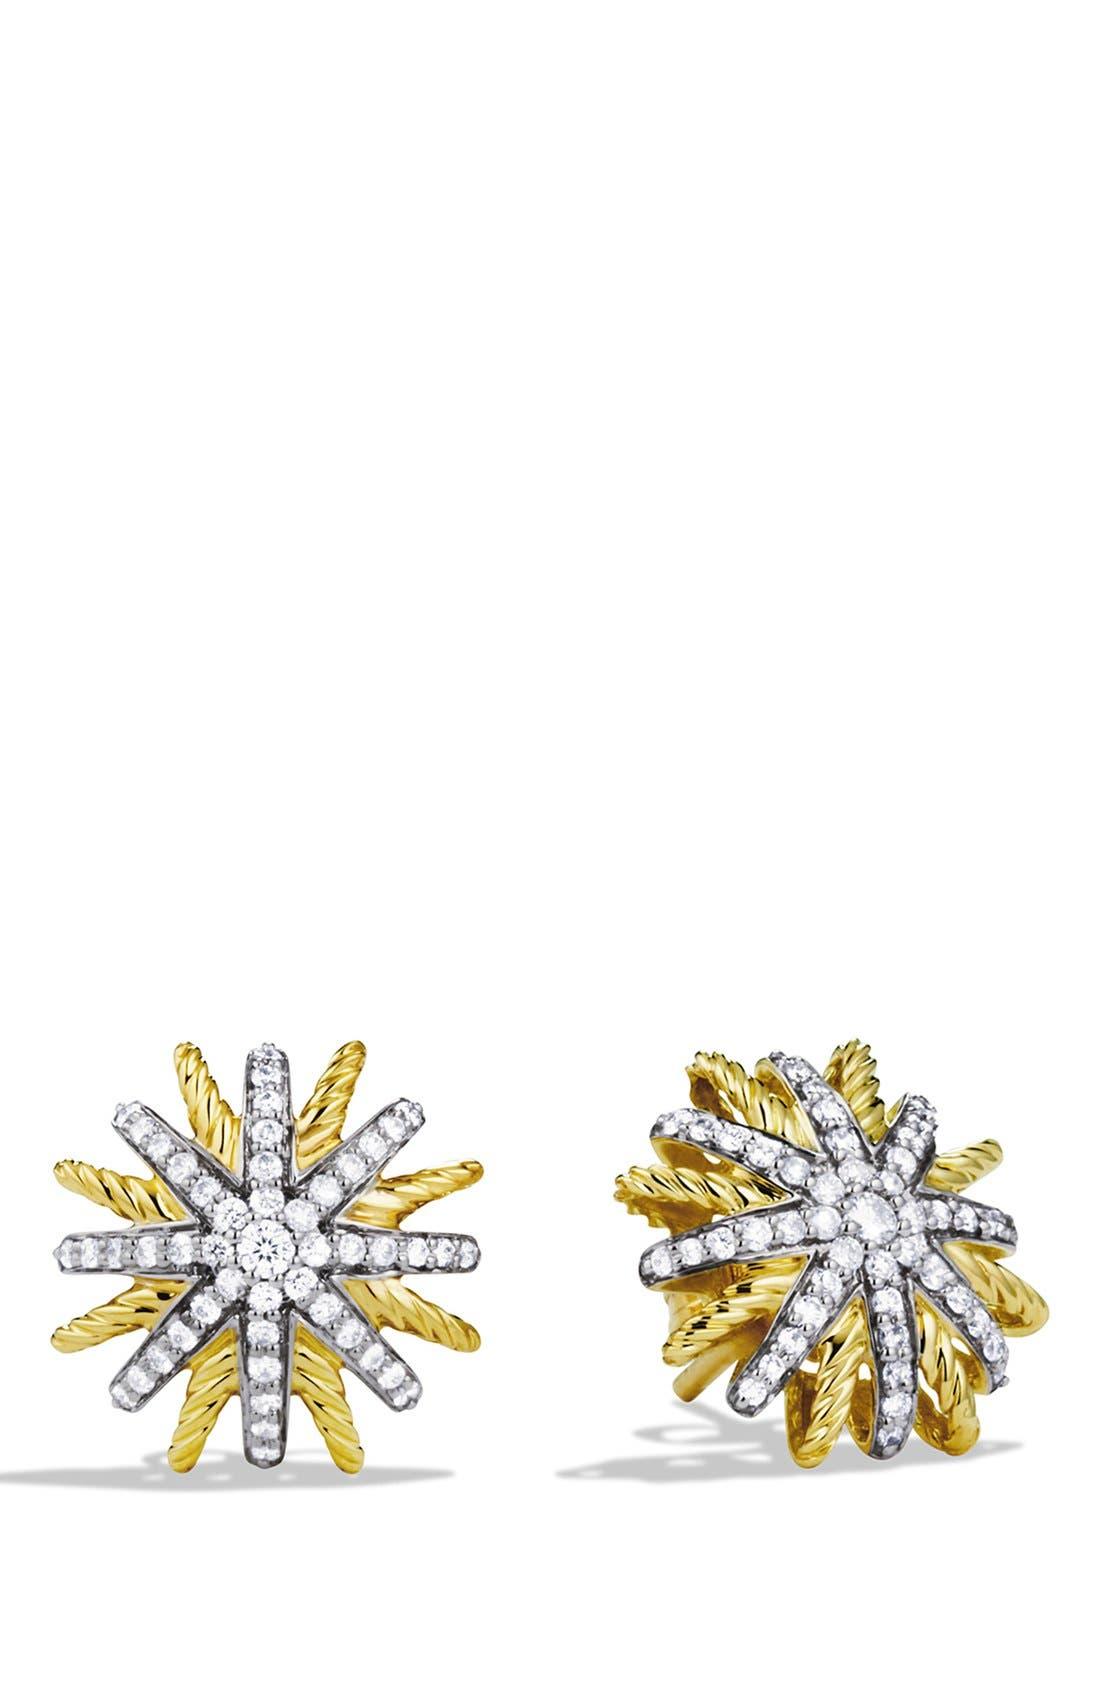 DAVID YURMAN Starburst Extra-Small Earrings with Diamonds in Gold